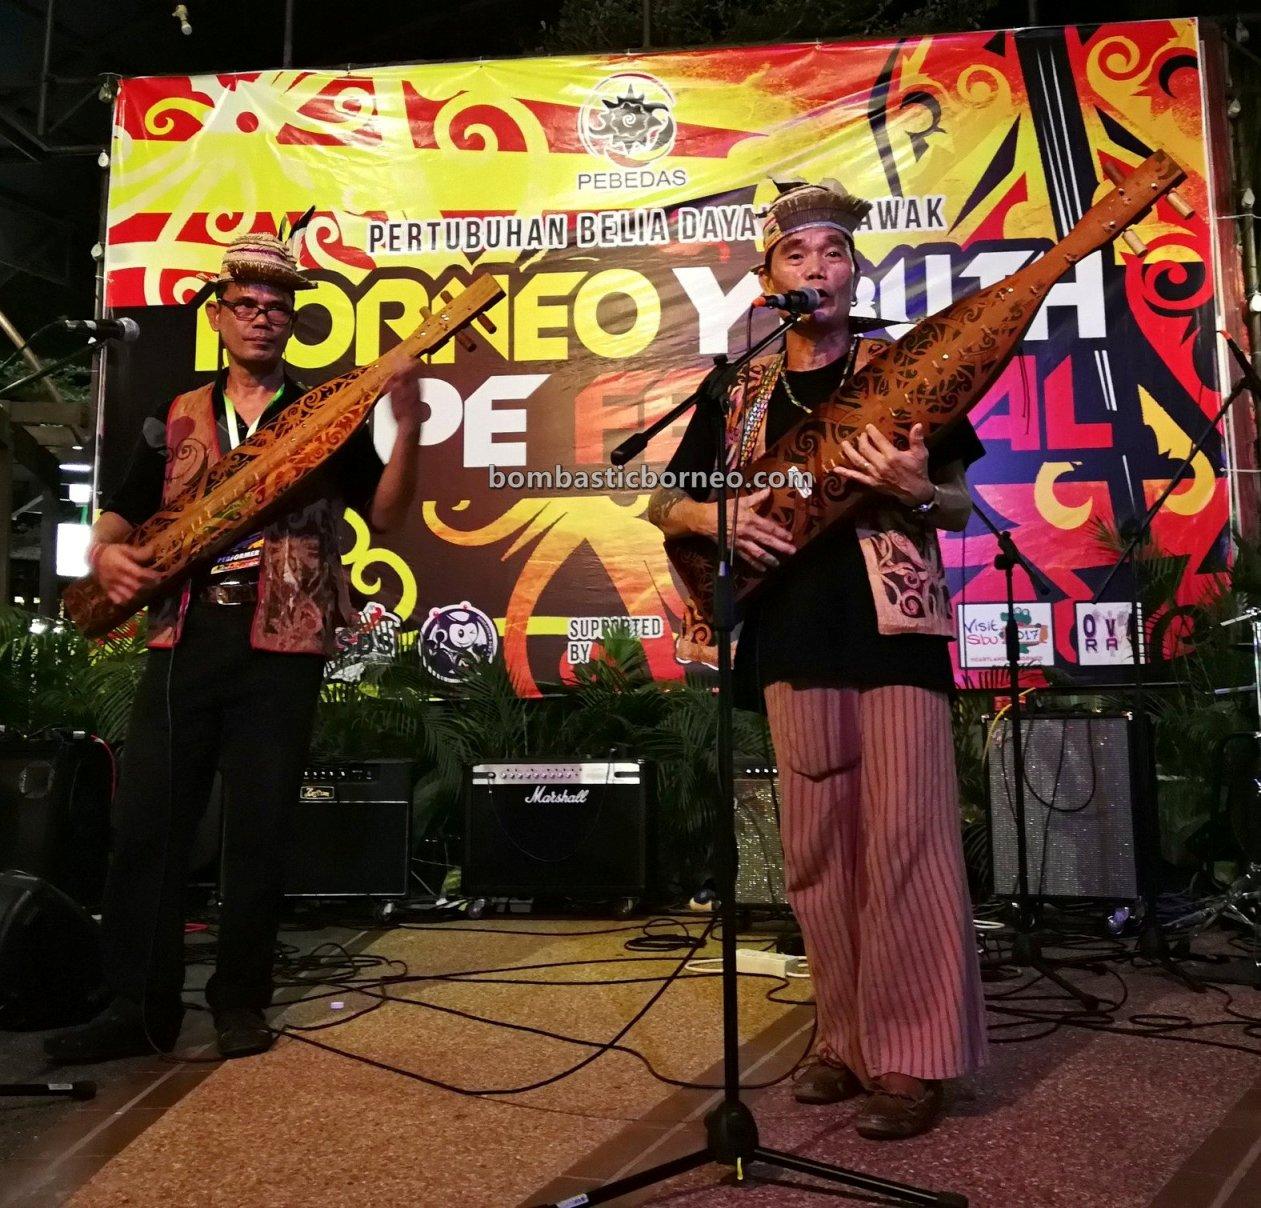 Borneo guitar, Youth Sape Festival, authentic, culture, native, indigenous, orang ulu, tribe, Tourism, tourist attraction, travel guide, Trans Border, 婆罗洲肯雅族沙贝,, 砂拉越马来西亚, 原住民音乐文化,